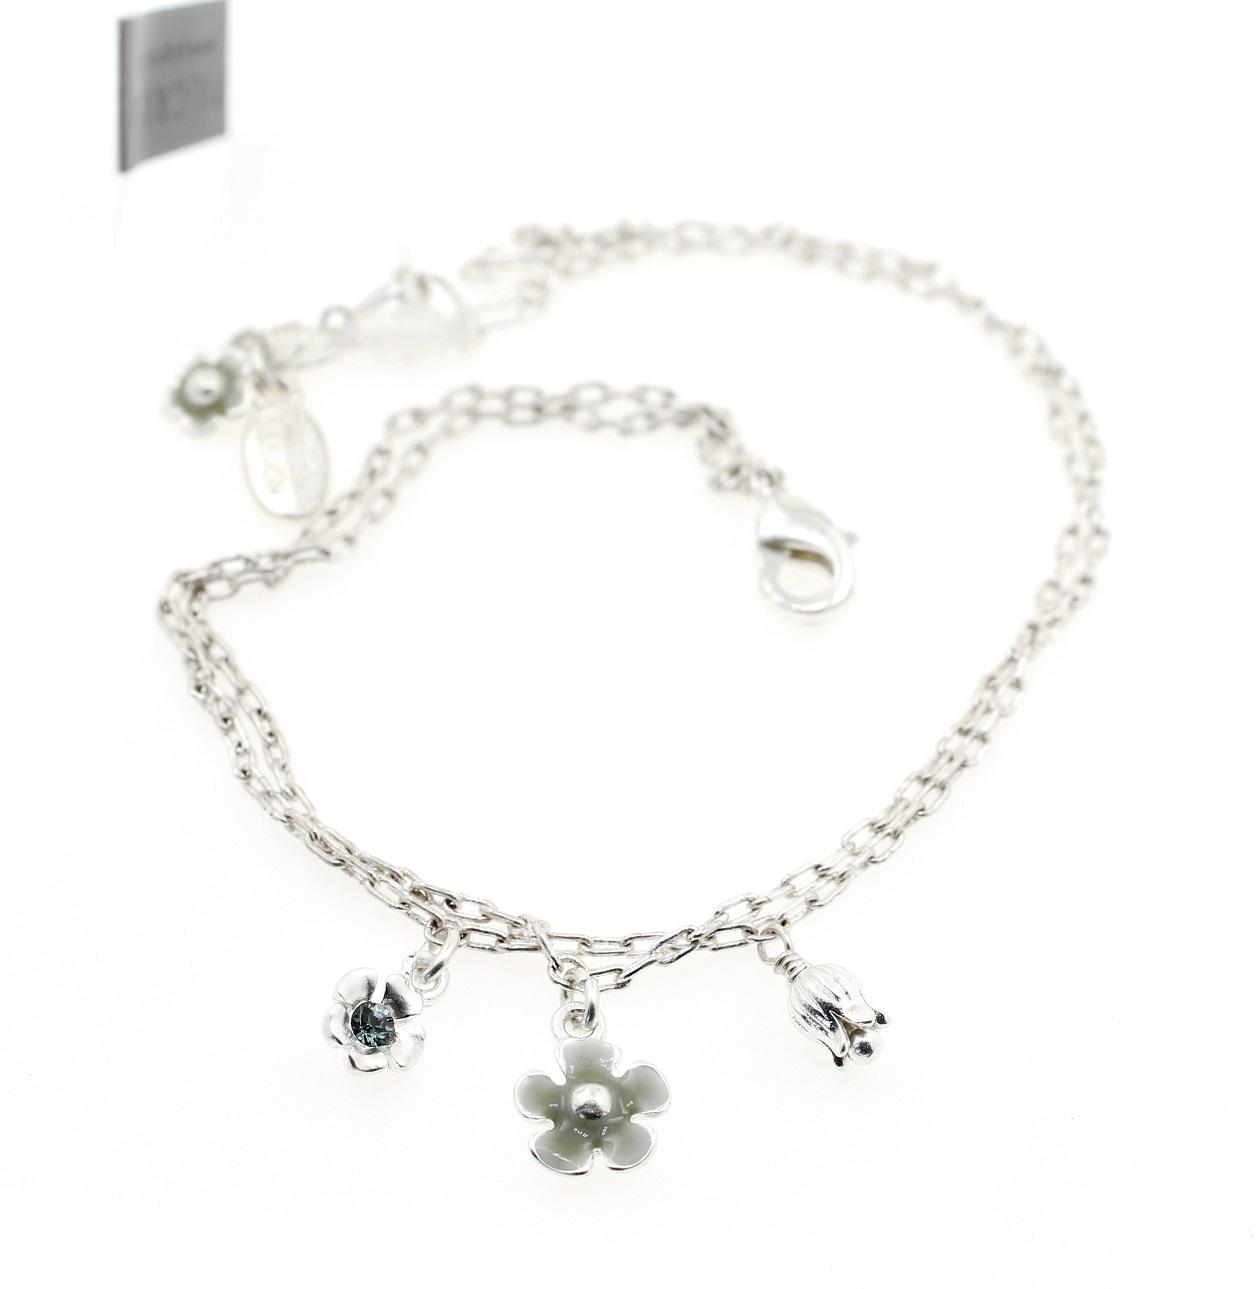 PILGRIM - Bell Flower - Ankle Chain - Silver/Blue BNWT